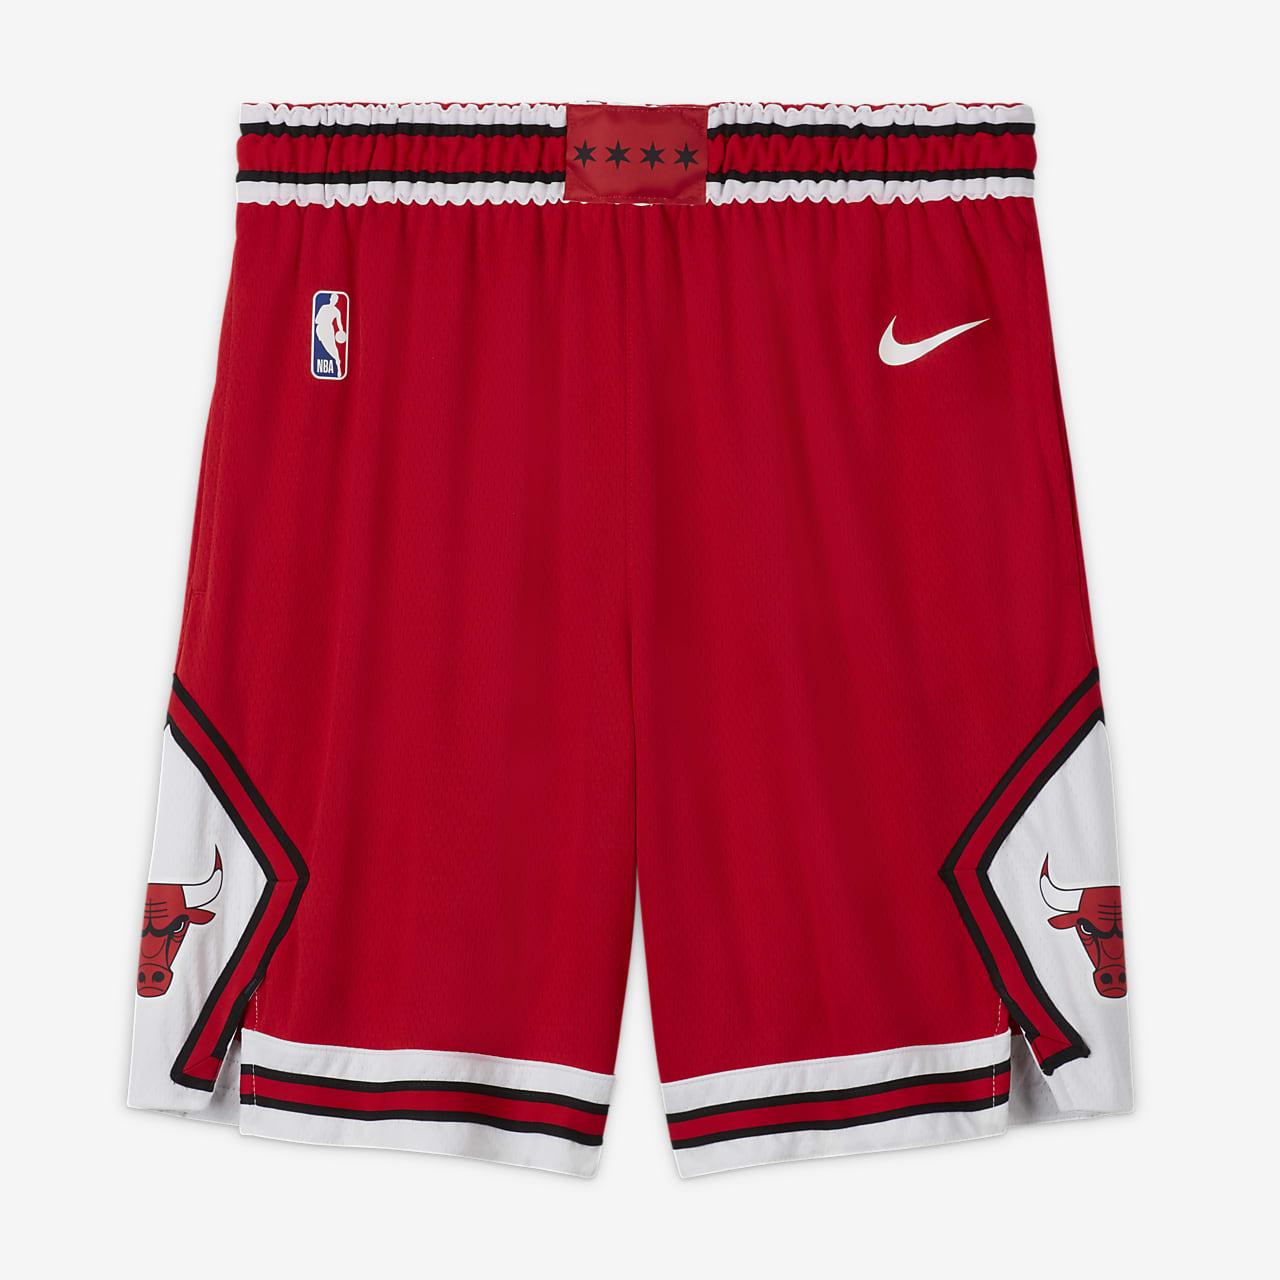 Shorts Nike de la NBA para hombre Chicago Bulls Icon Edition Swingman